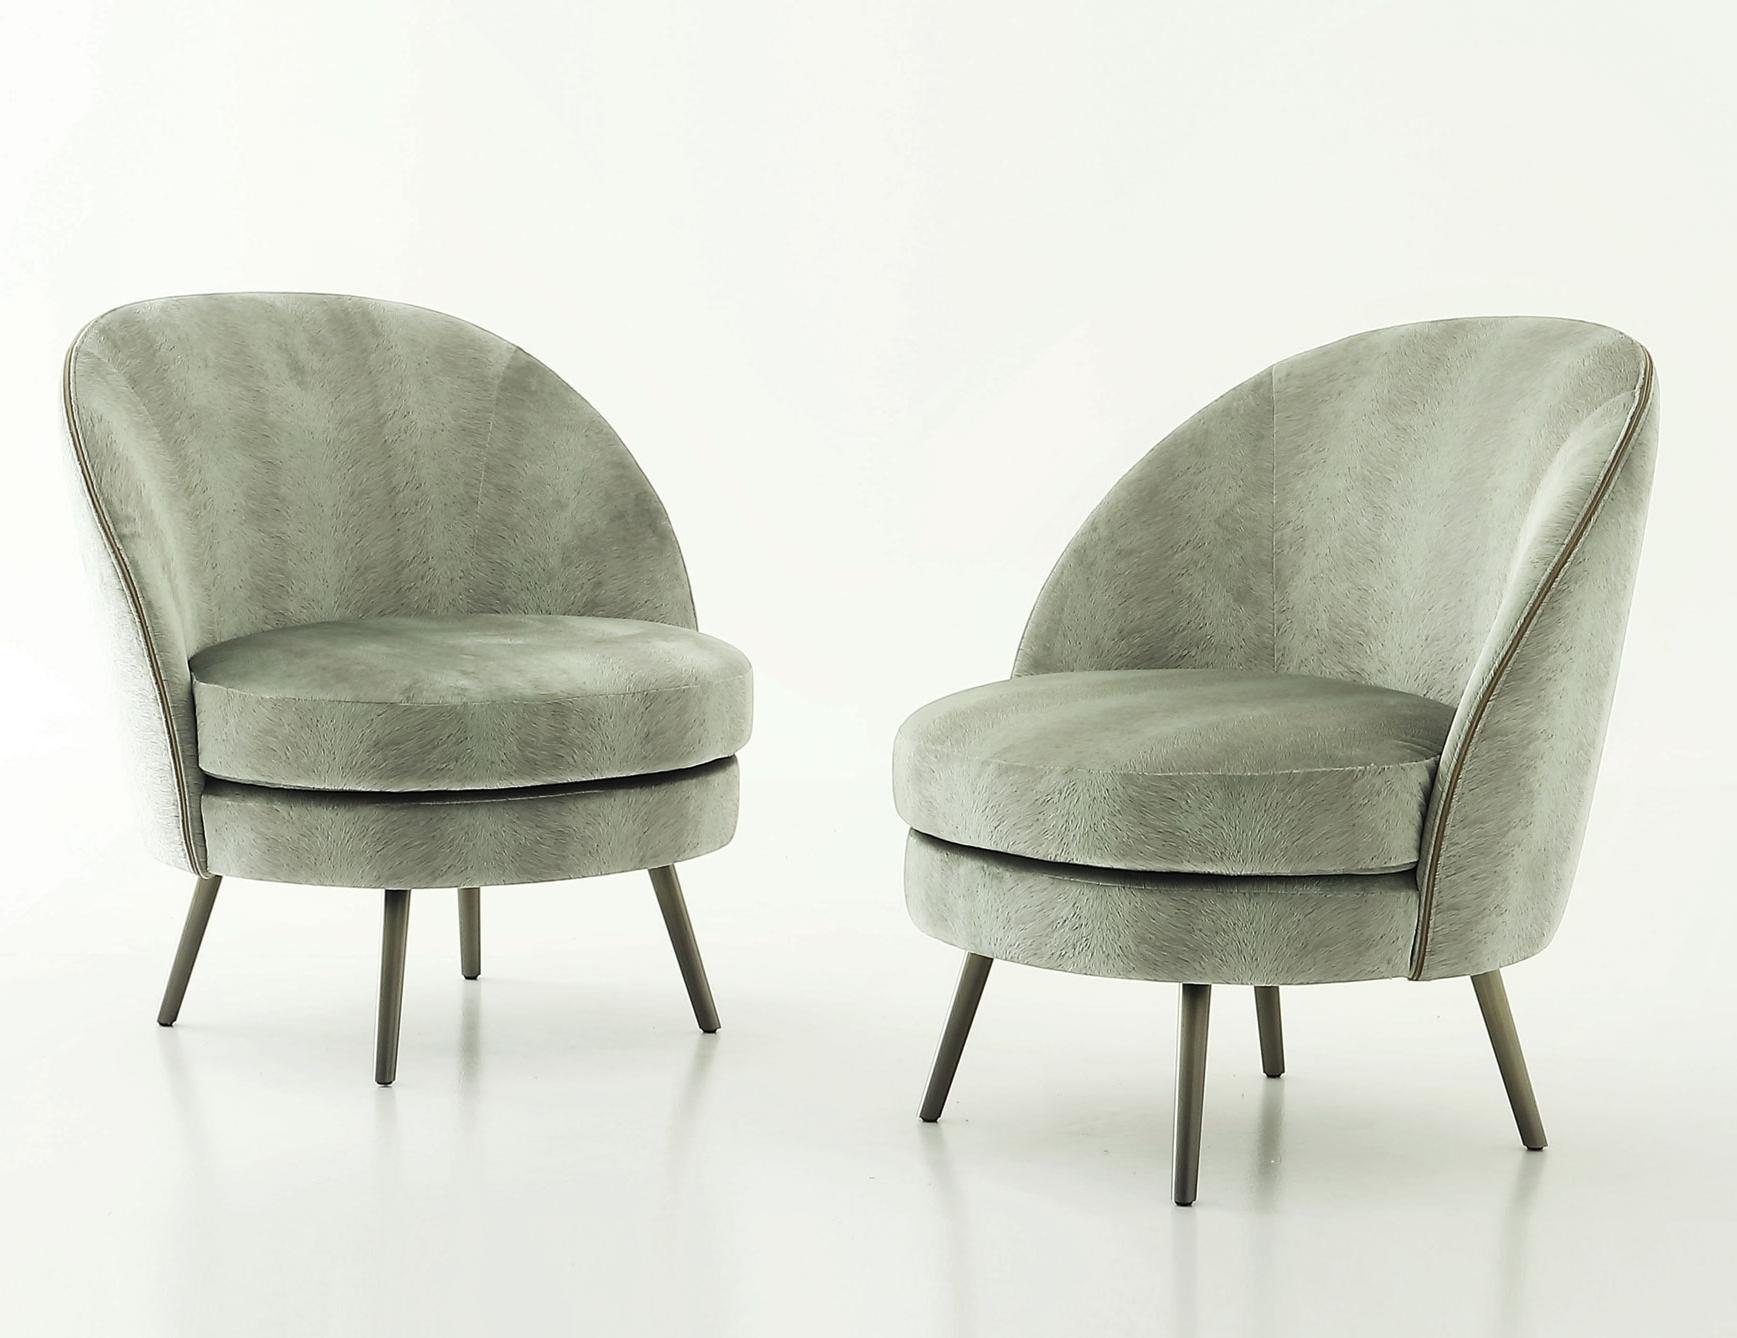 2017 Nella Vetrina Rugiano Perla In Beige Upholstered Leather Armchair Regarding Perla Side Chairs (Gallery 8 of 20)